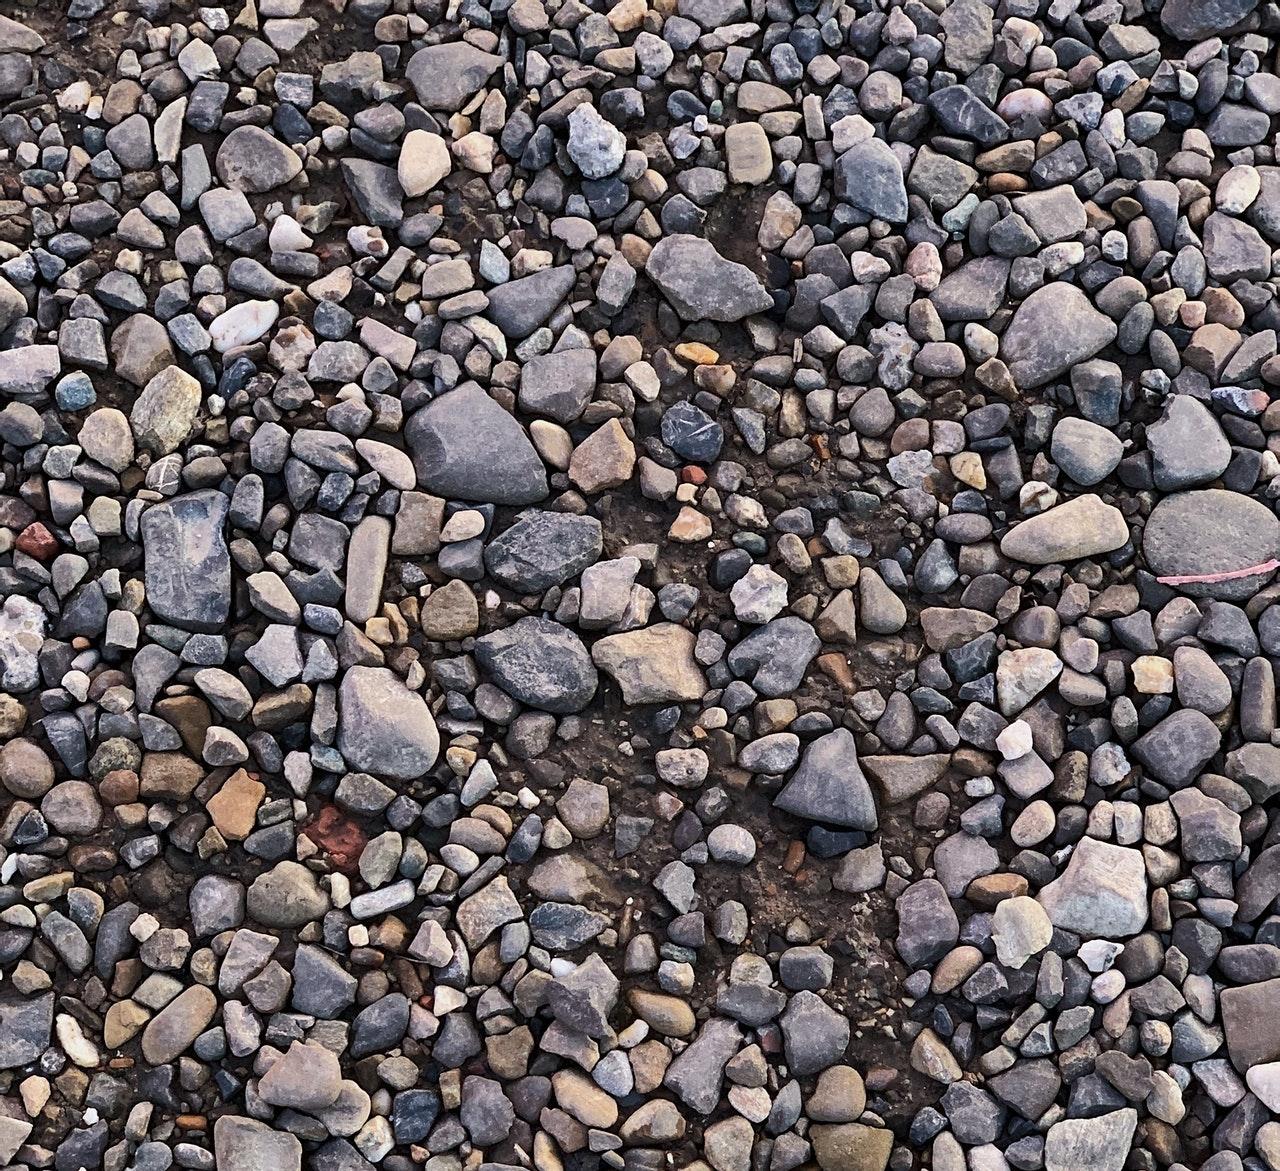 snackenglish, snack, gravel, stone, pebble, guijarros